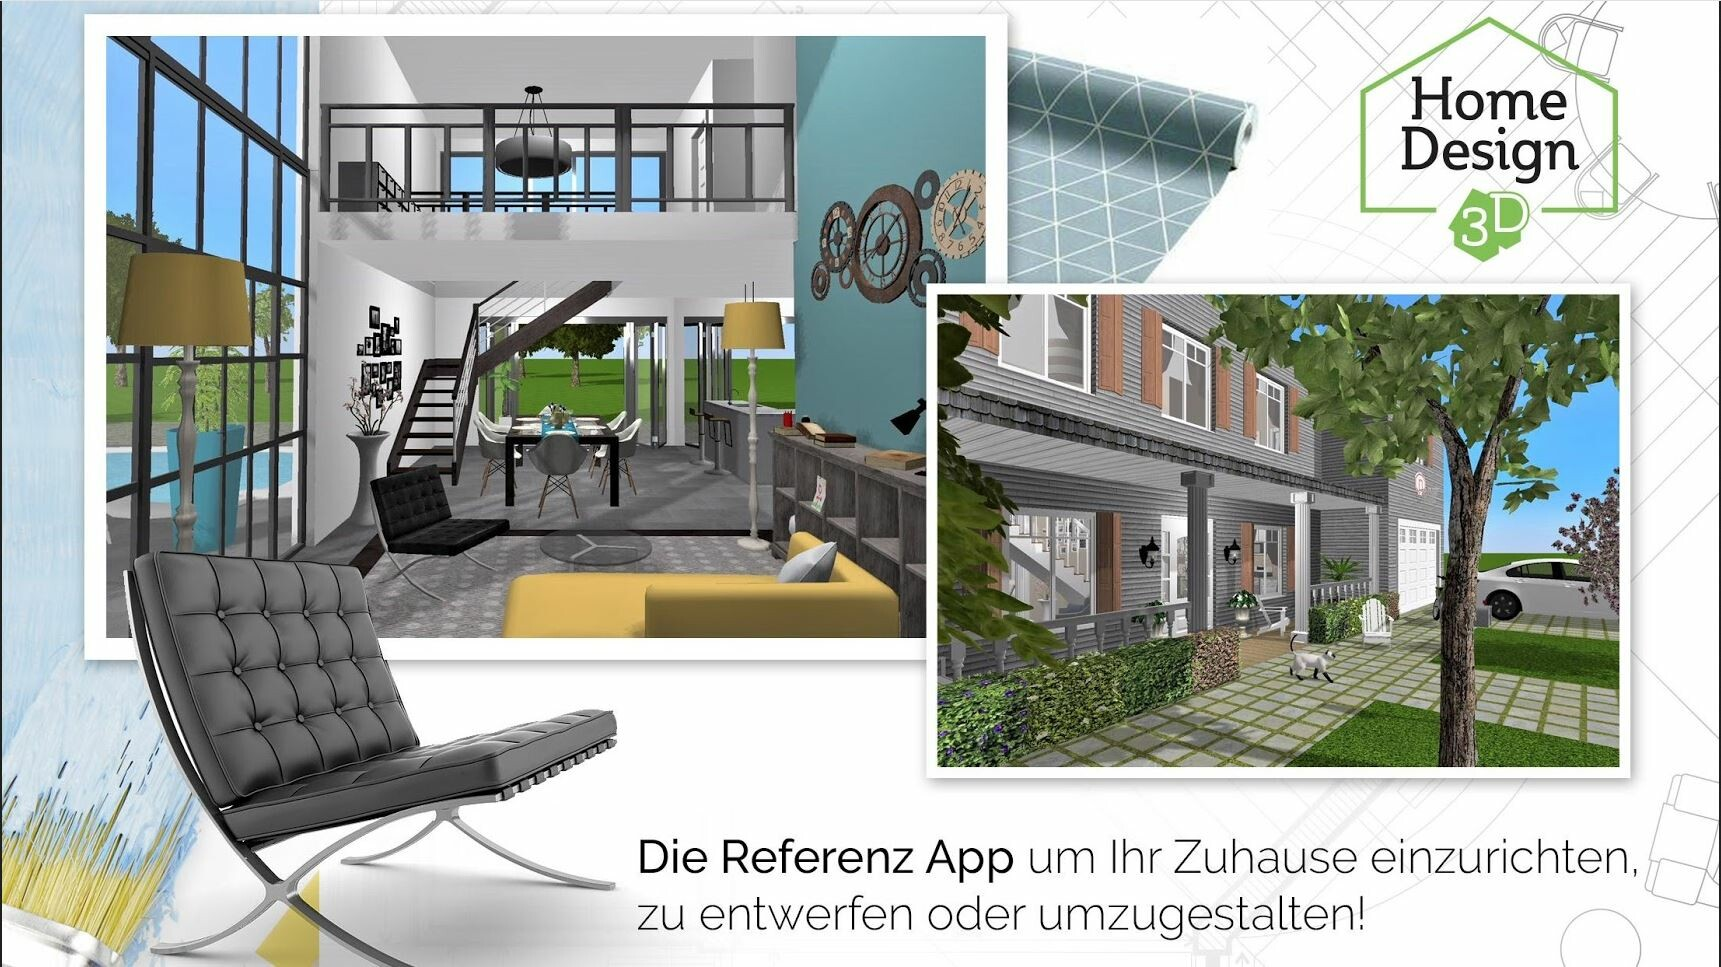 Home Design 20D   Download   NETZWELT